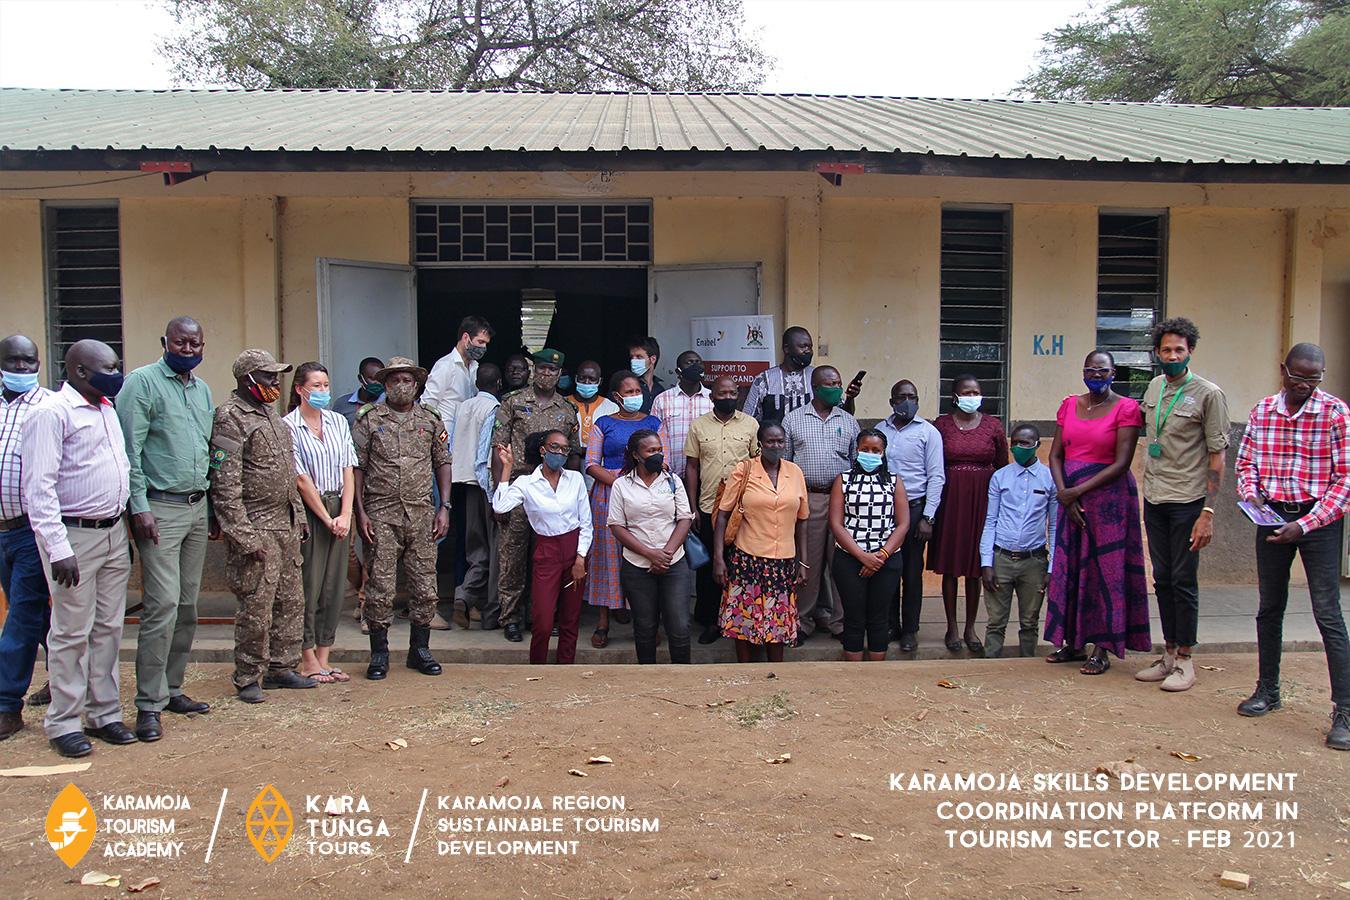 kara-tunga-karamoja-tourism-academy-stakeholder-meeting-2021-1